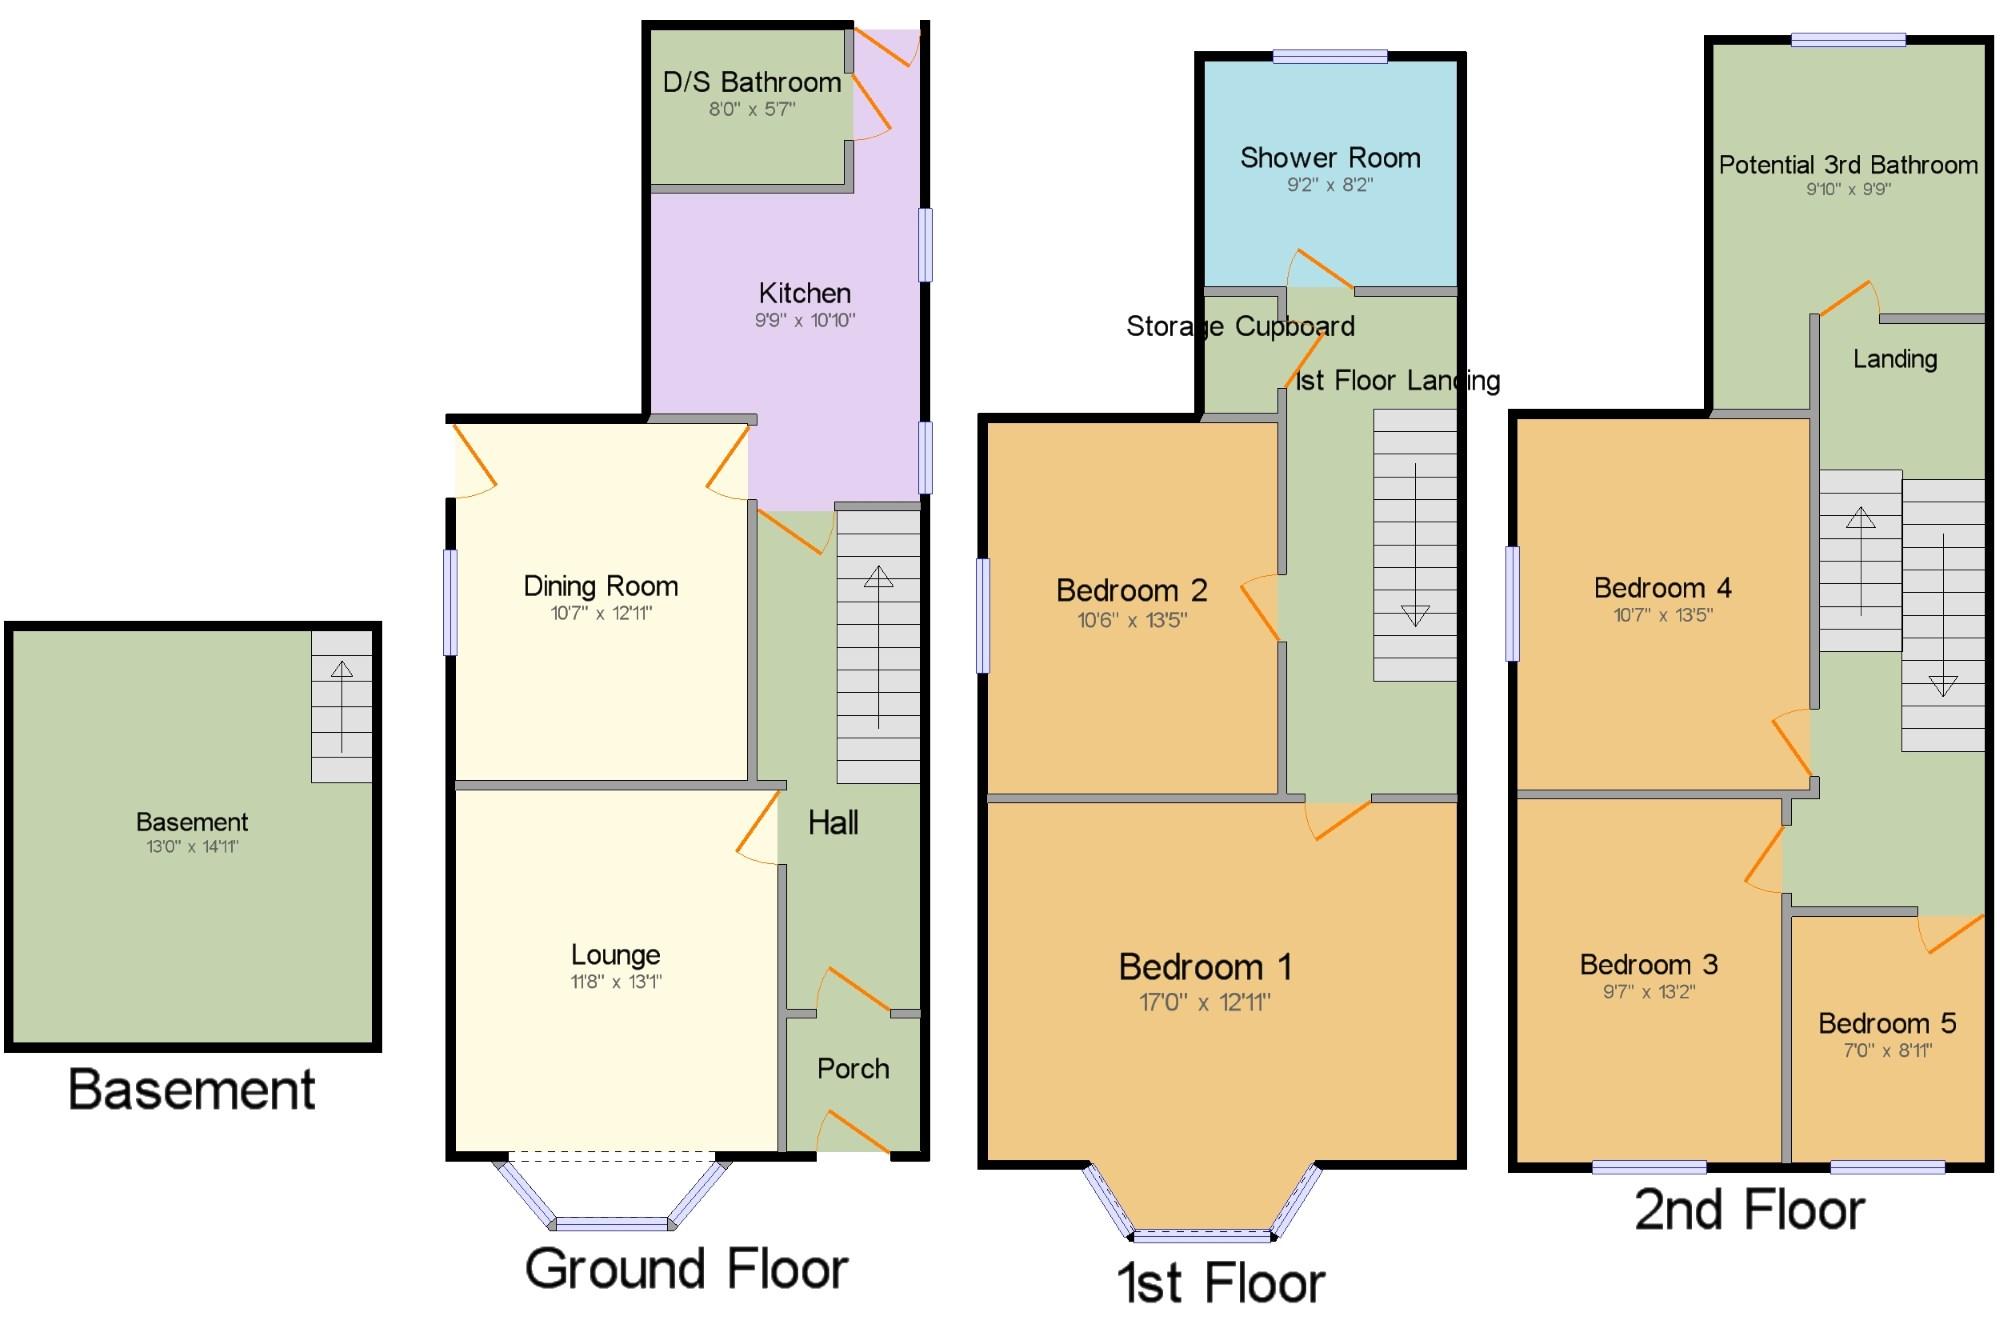 Marine terrace penmaenmawr conwy ll34 5 bedroom end for 50 marine terrace